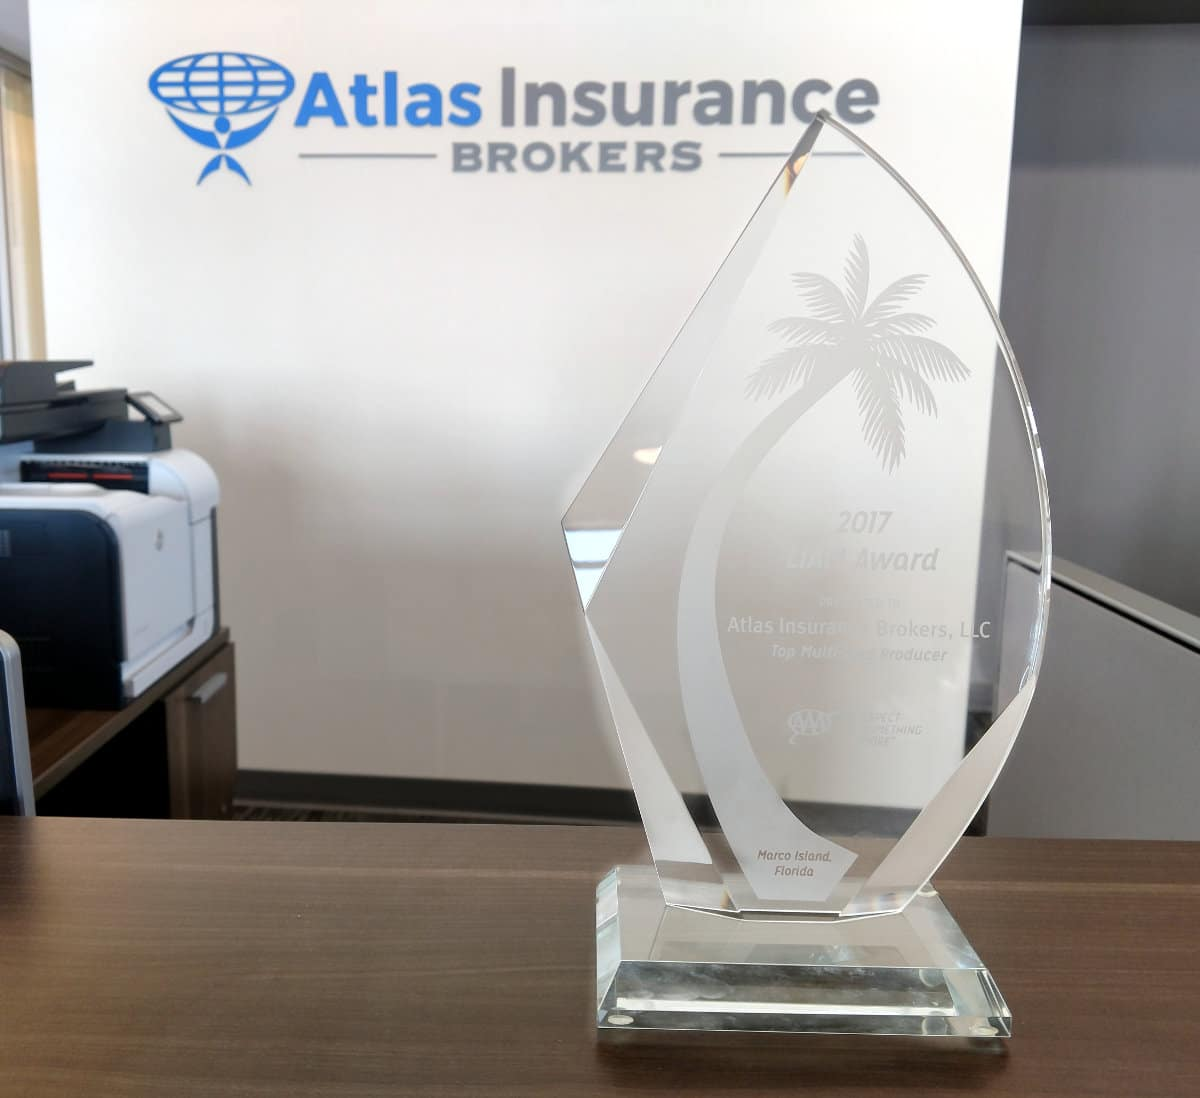 AAA Life Names Atlas Insurance Brokers Multi-Line Life